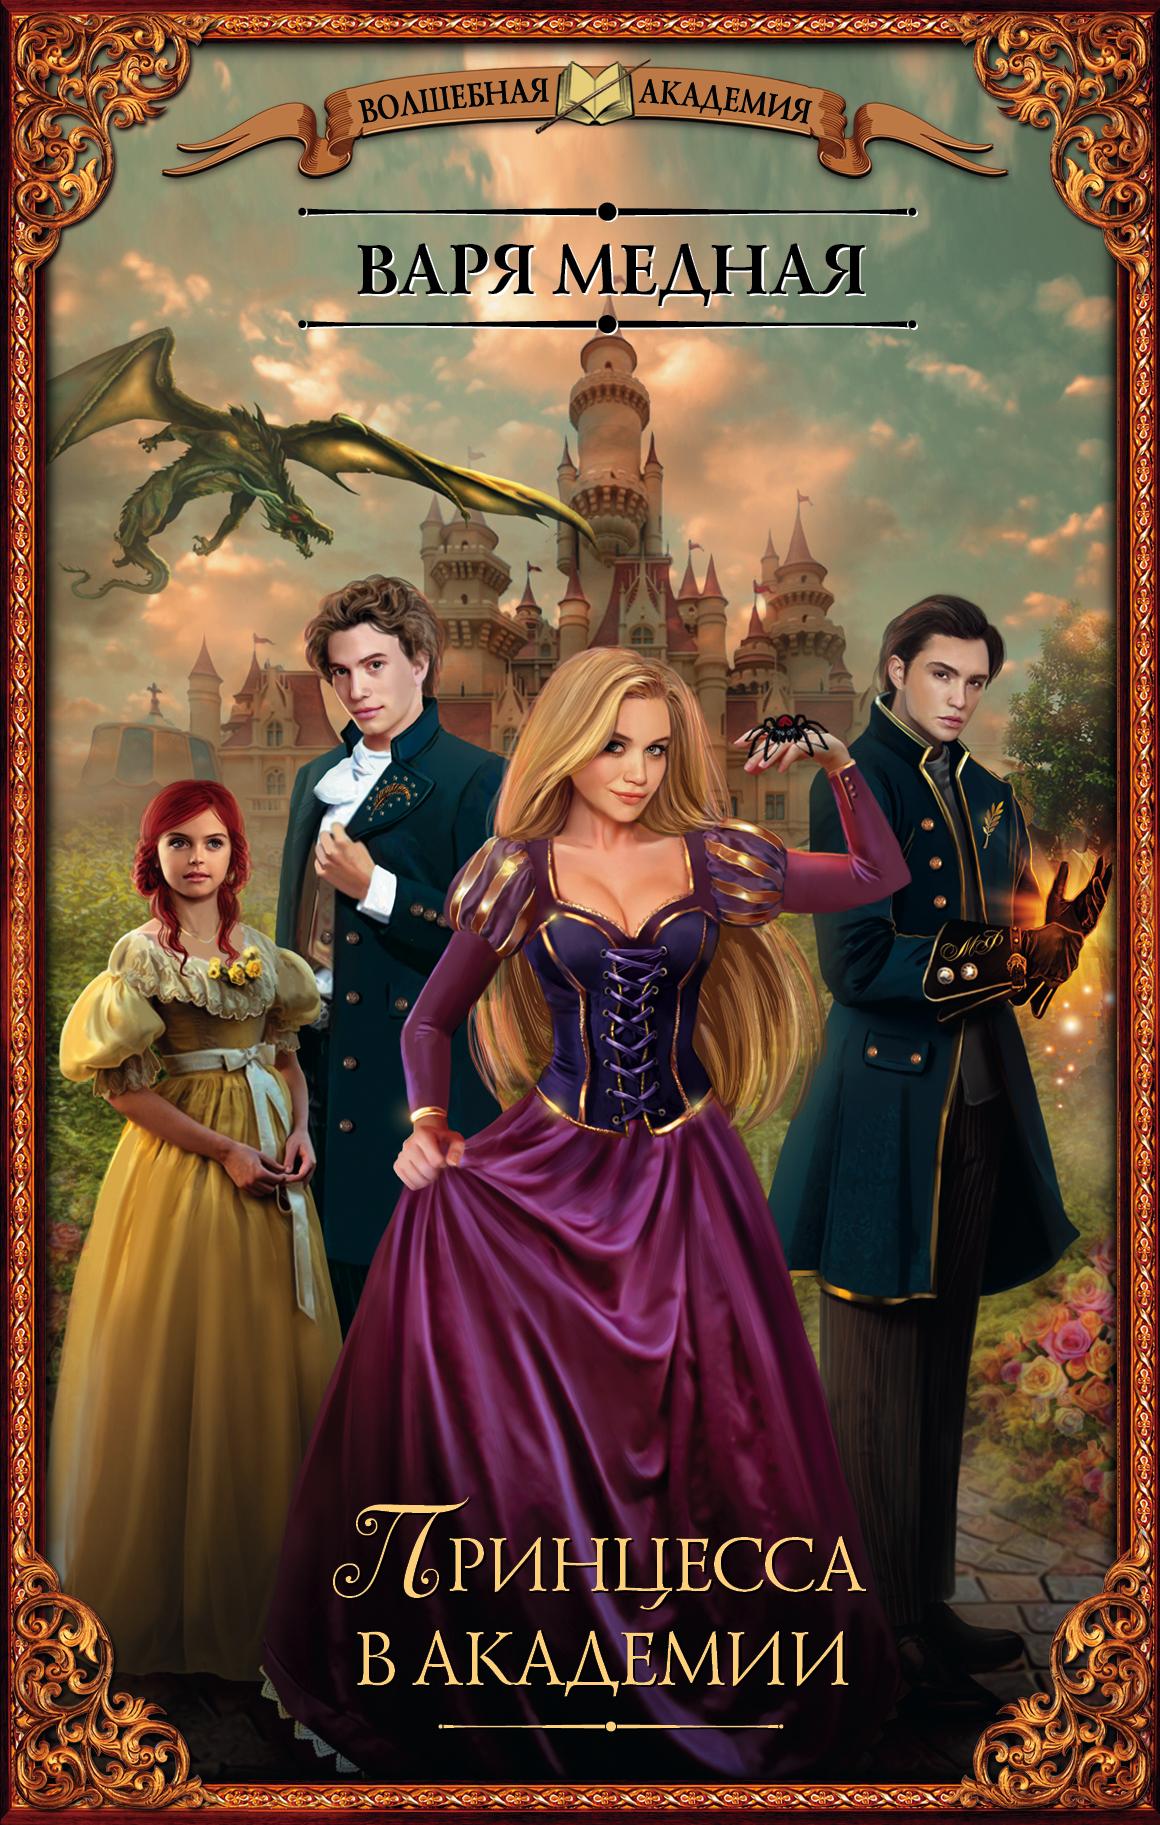 Картинки принцесса и дракон